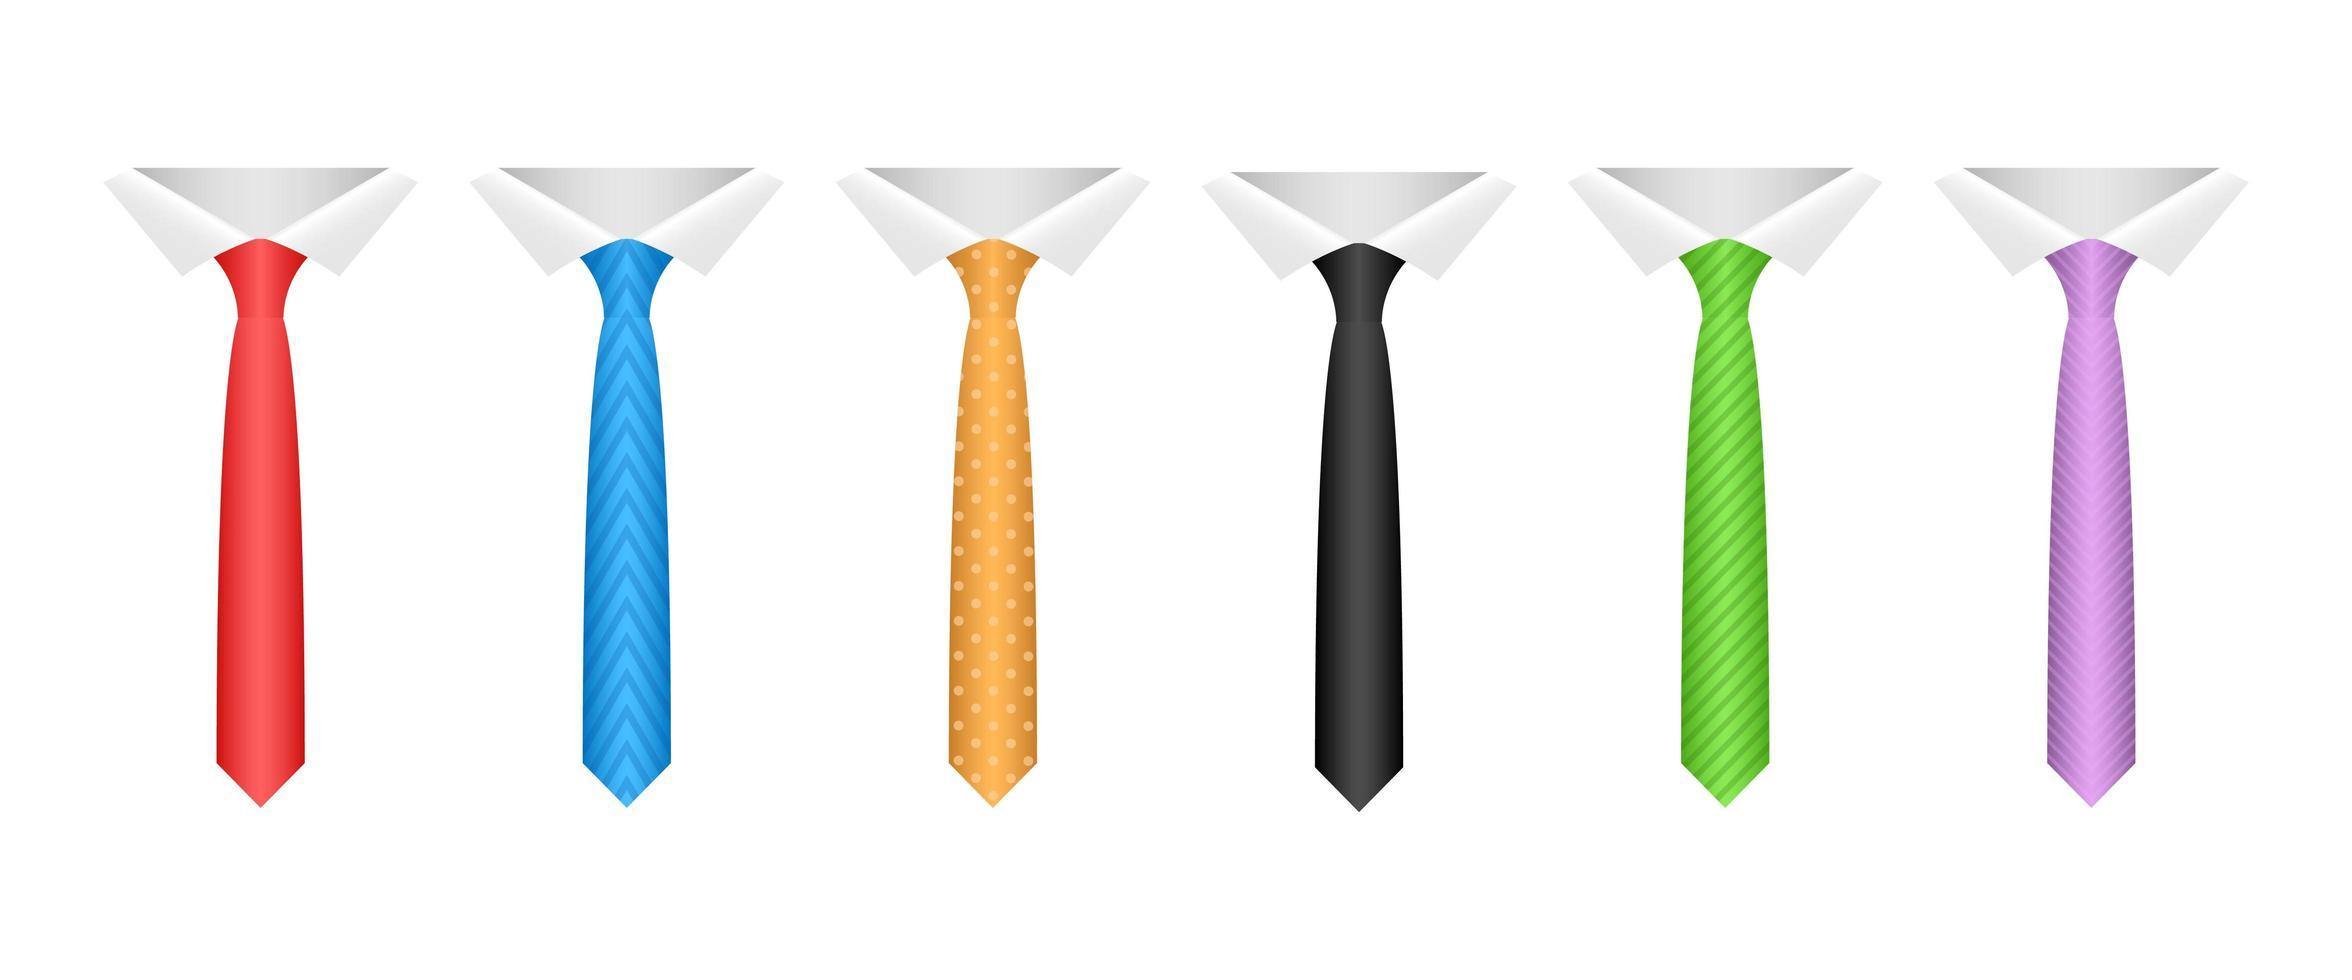 hals slips vektor design illustration isolerad på vit bakgrund